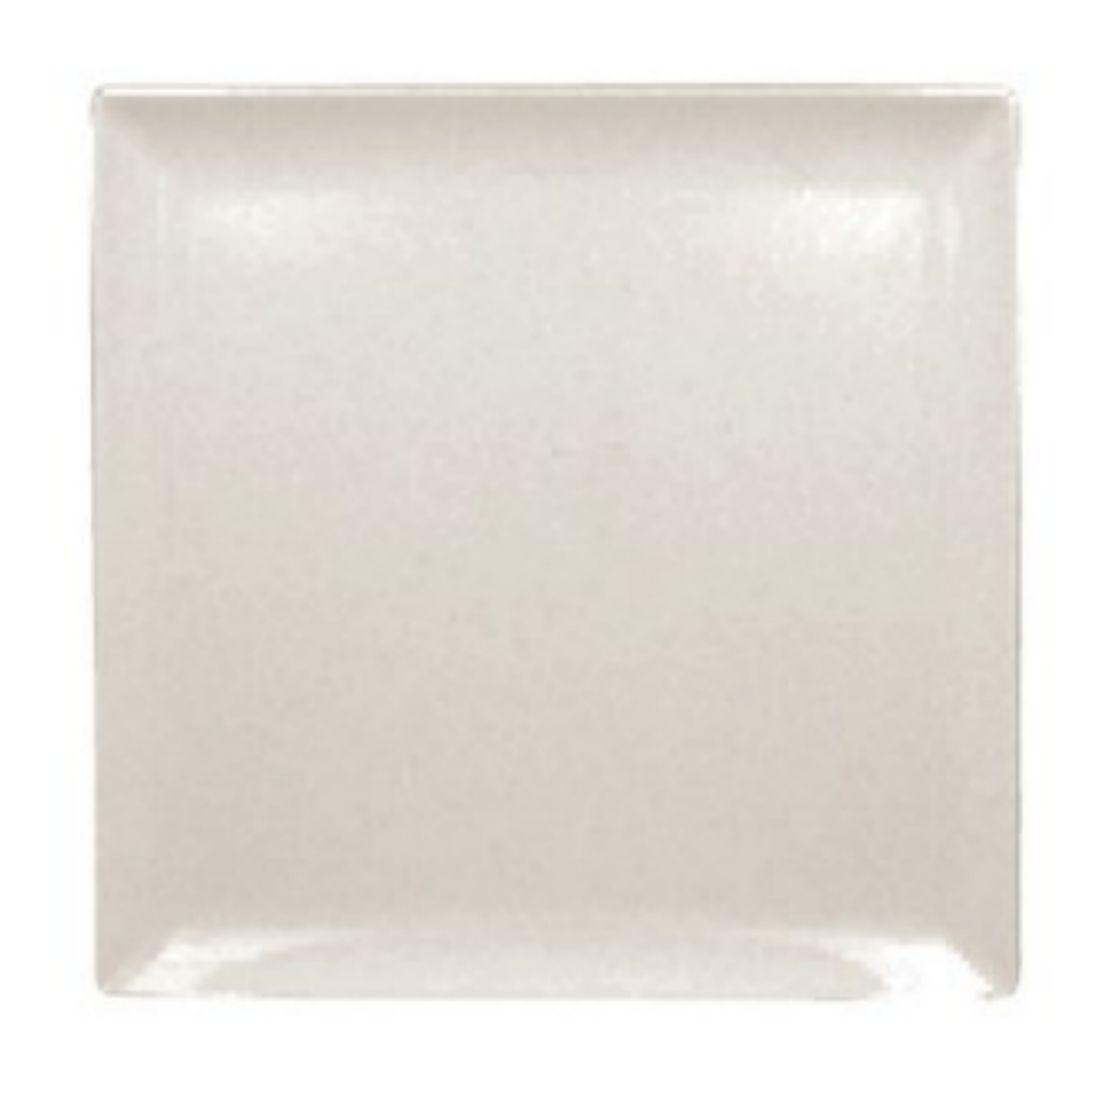 Nano talíř mělký - čtvercový 30 cm